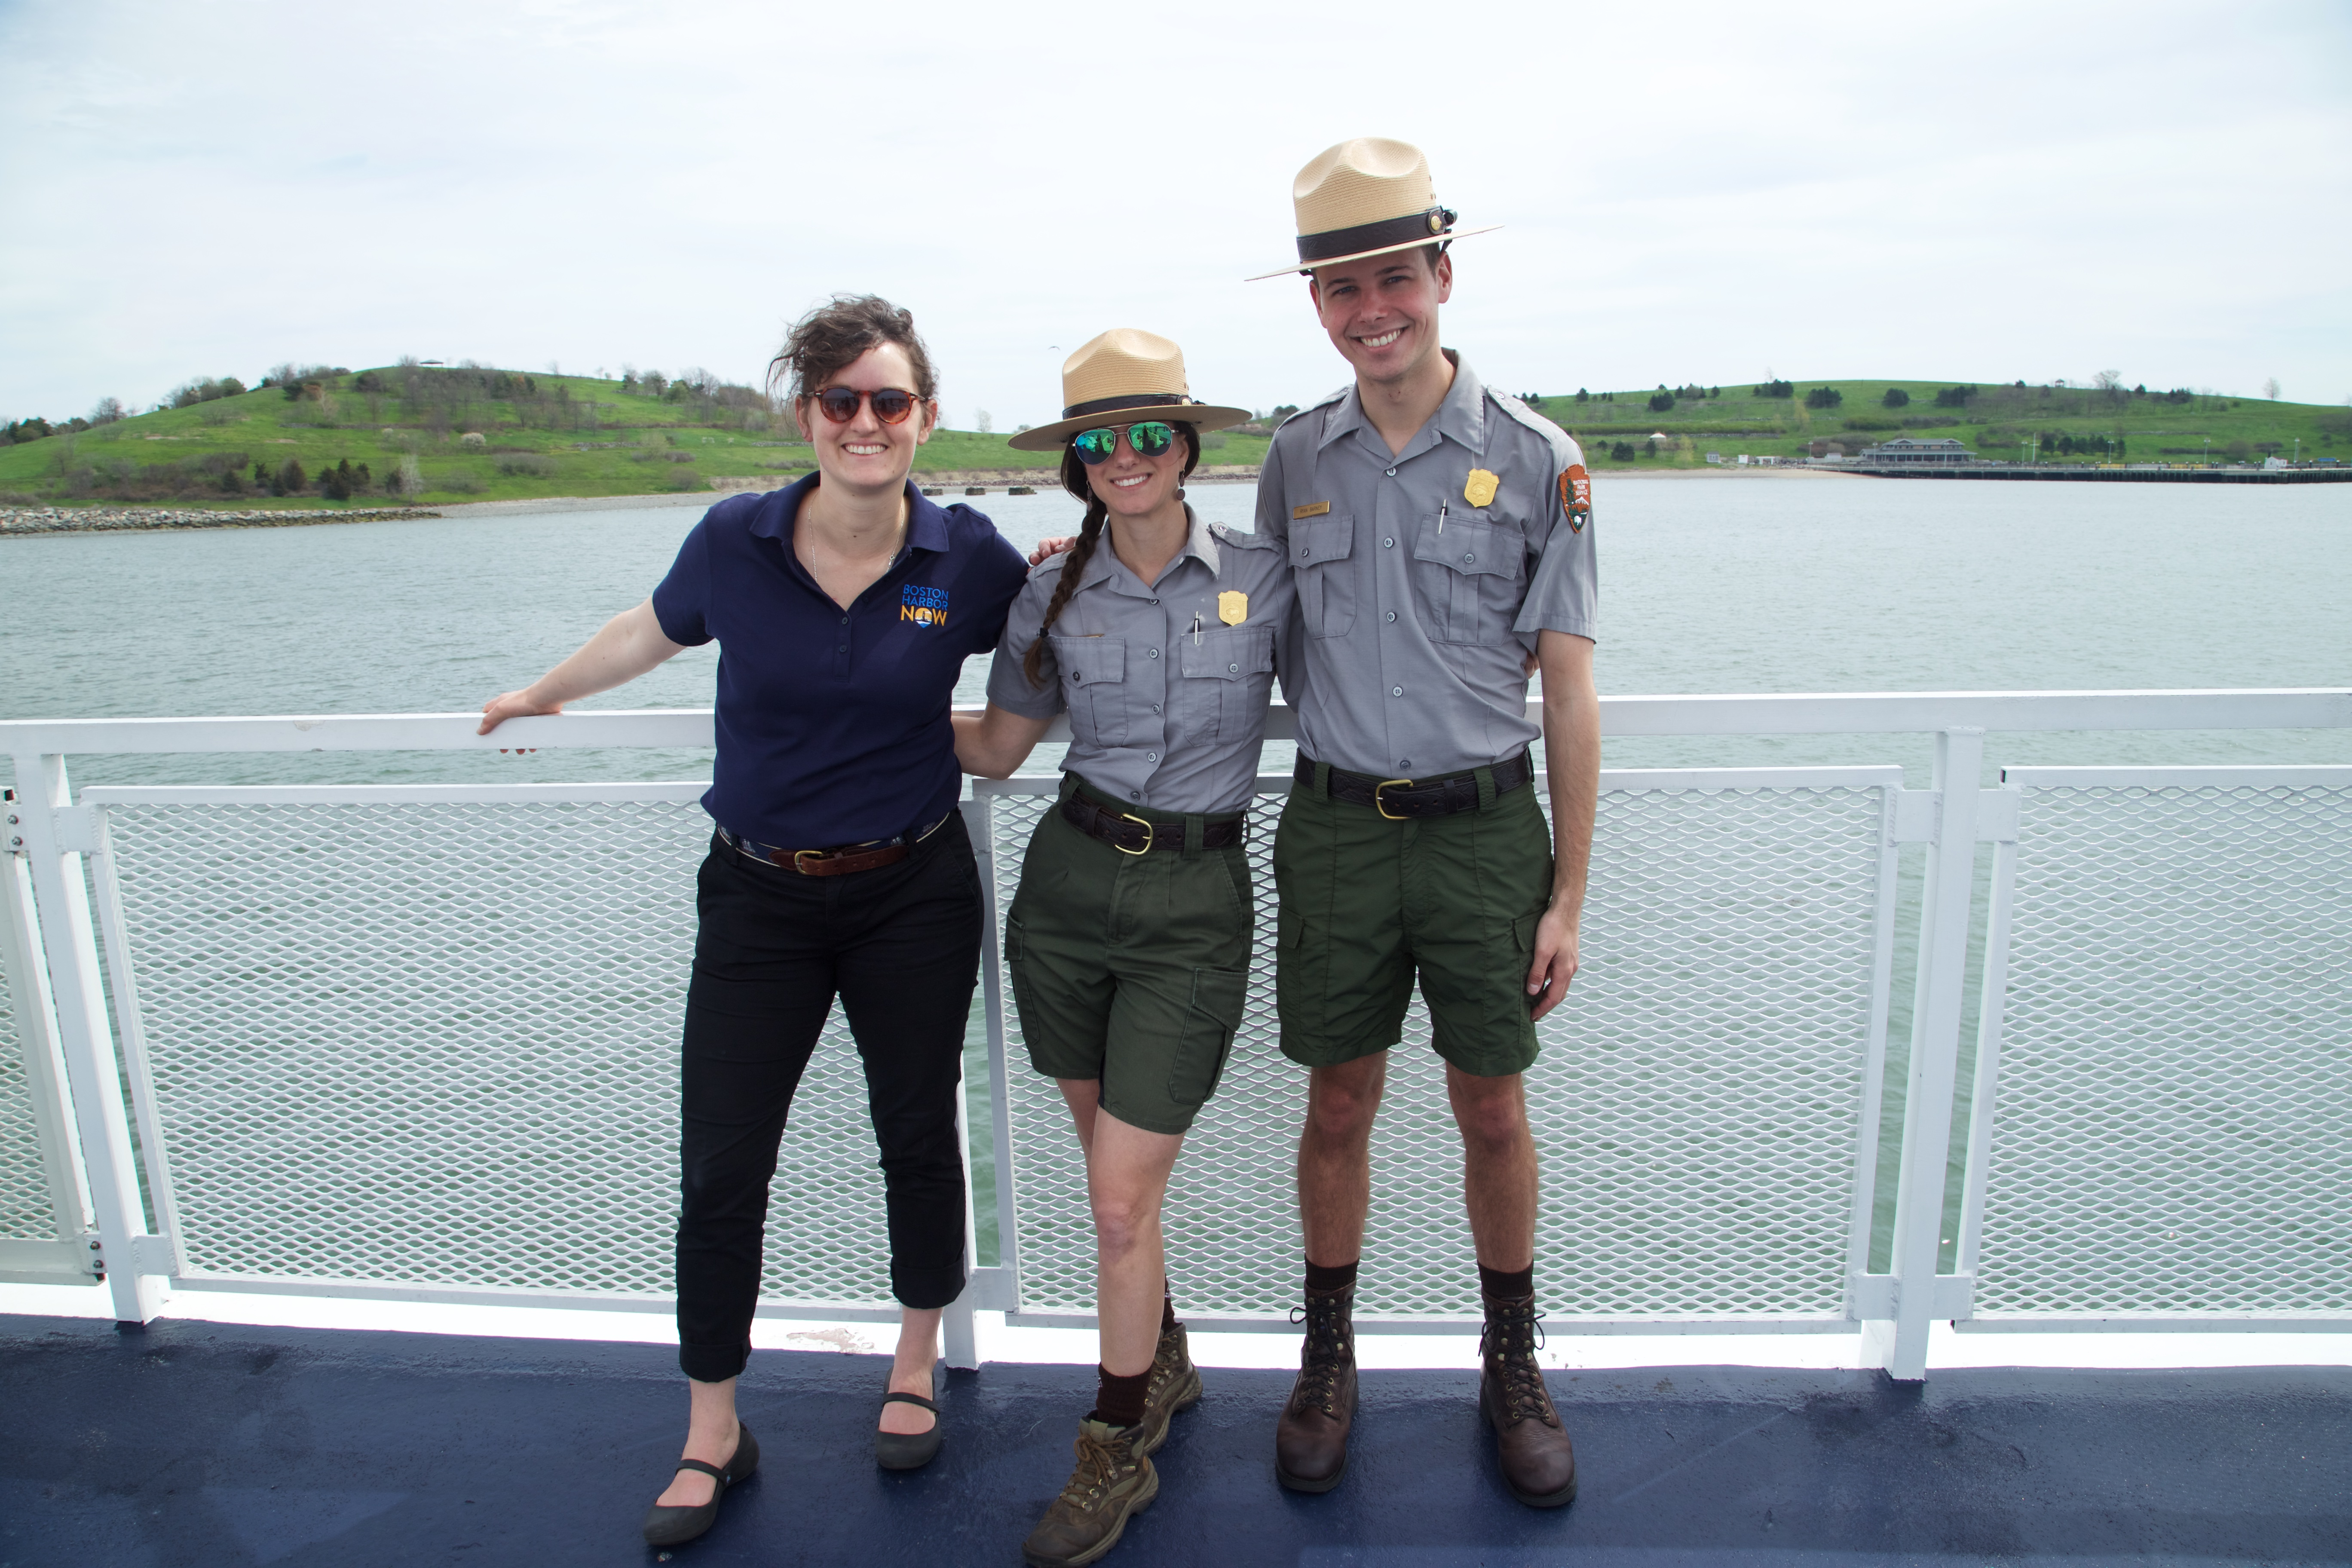 Park Rangers with BHN on ferry